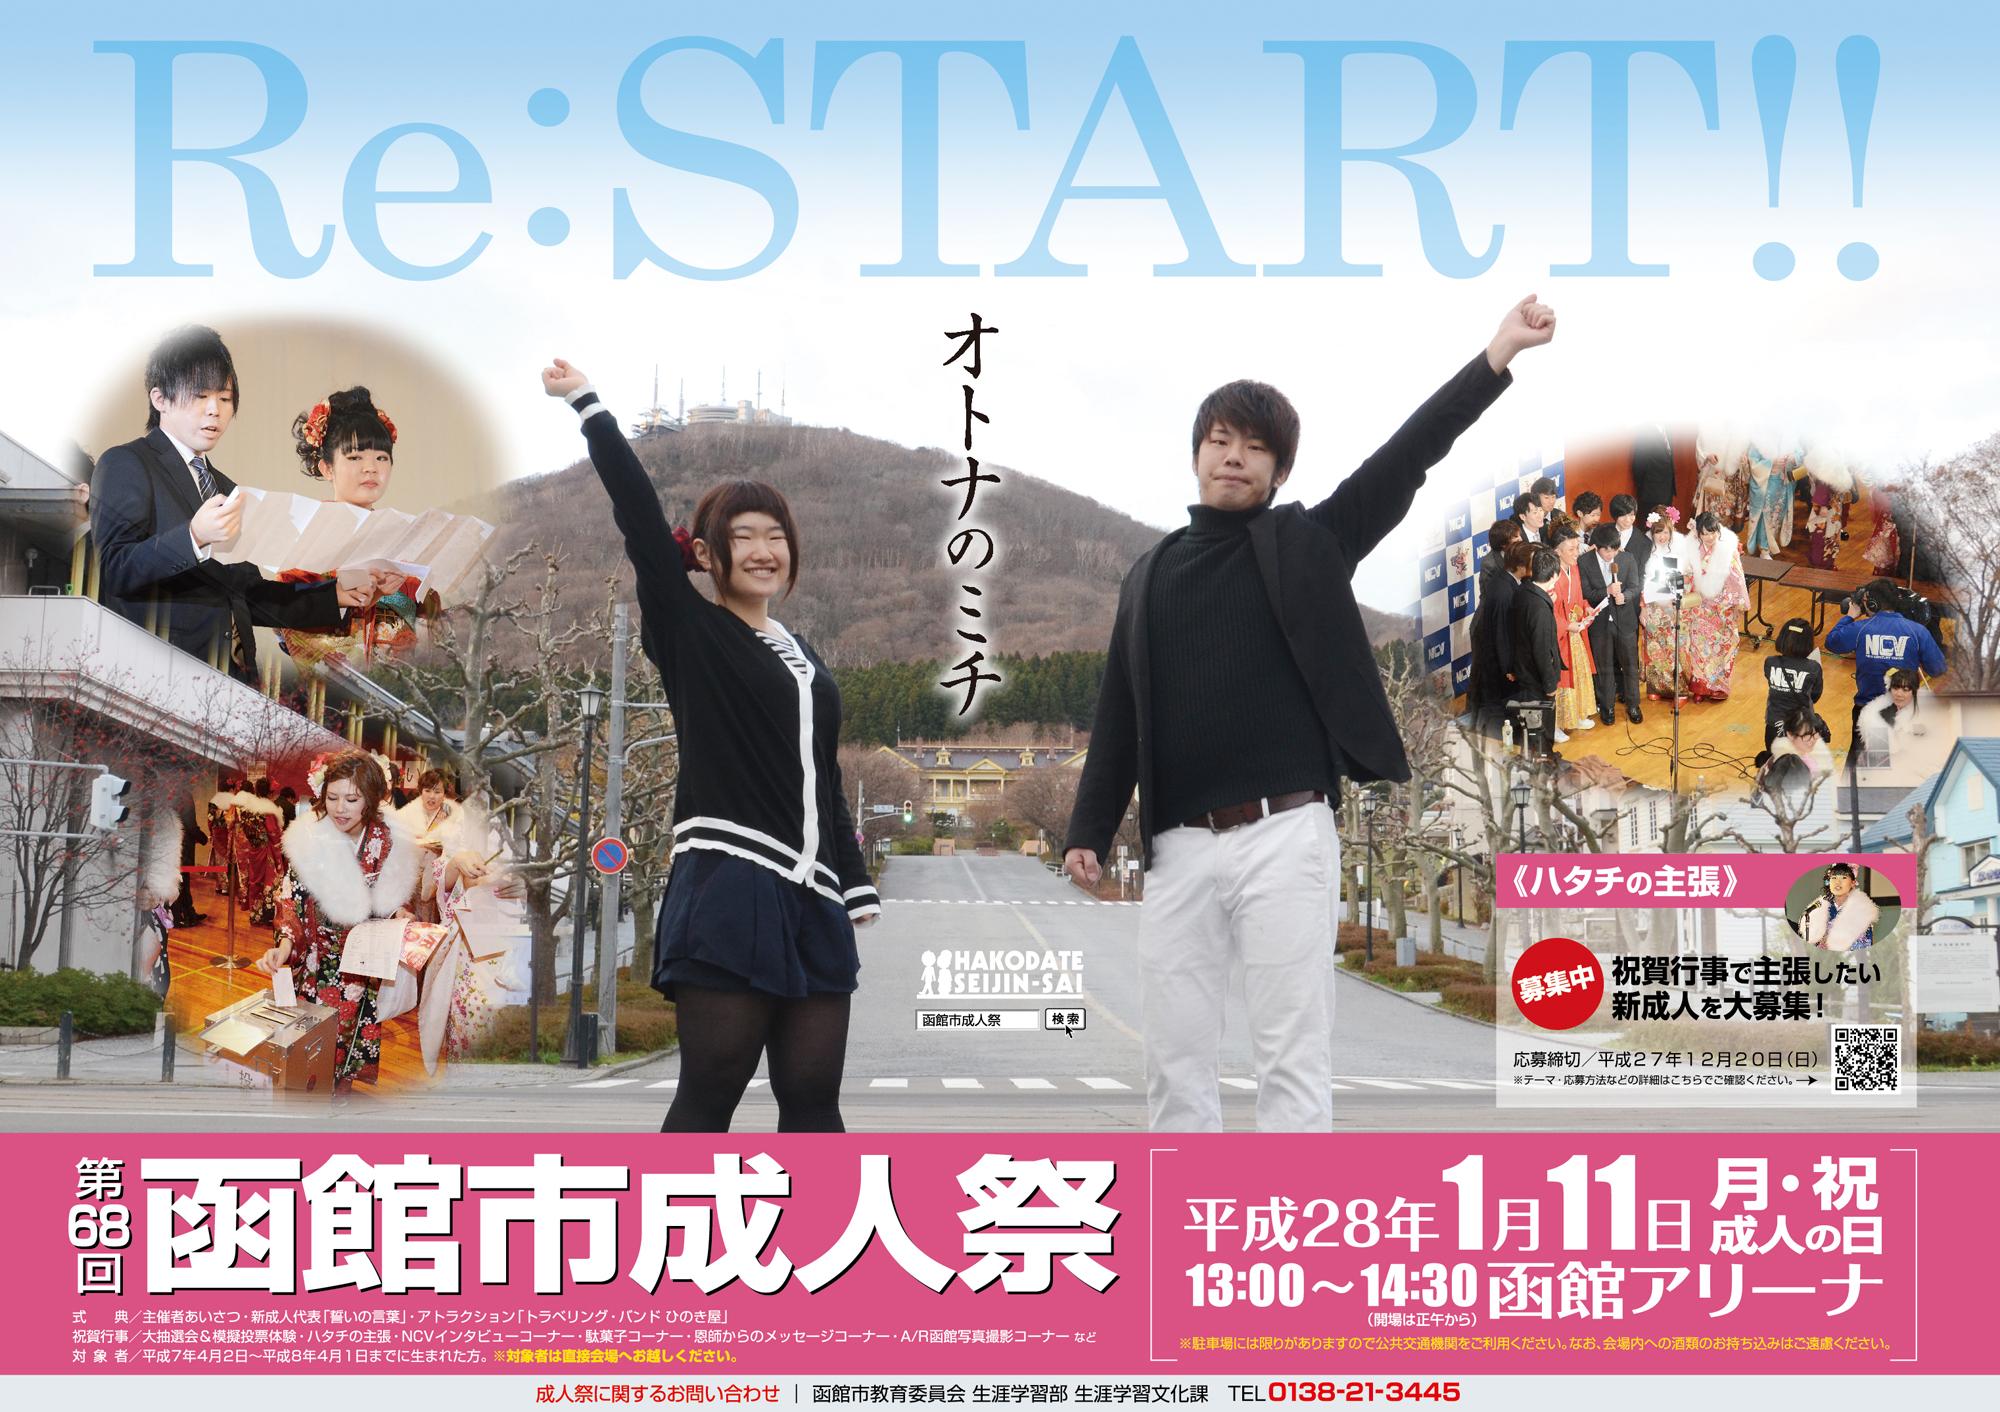 http://www.hakodate20.com/image/seijinsai68ol.jpg